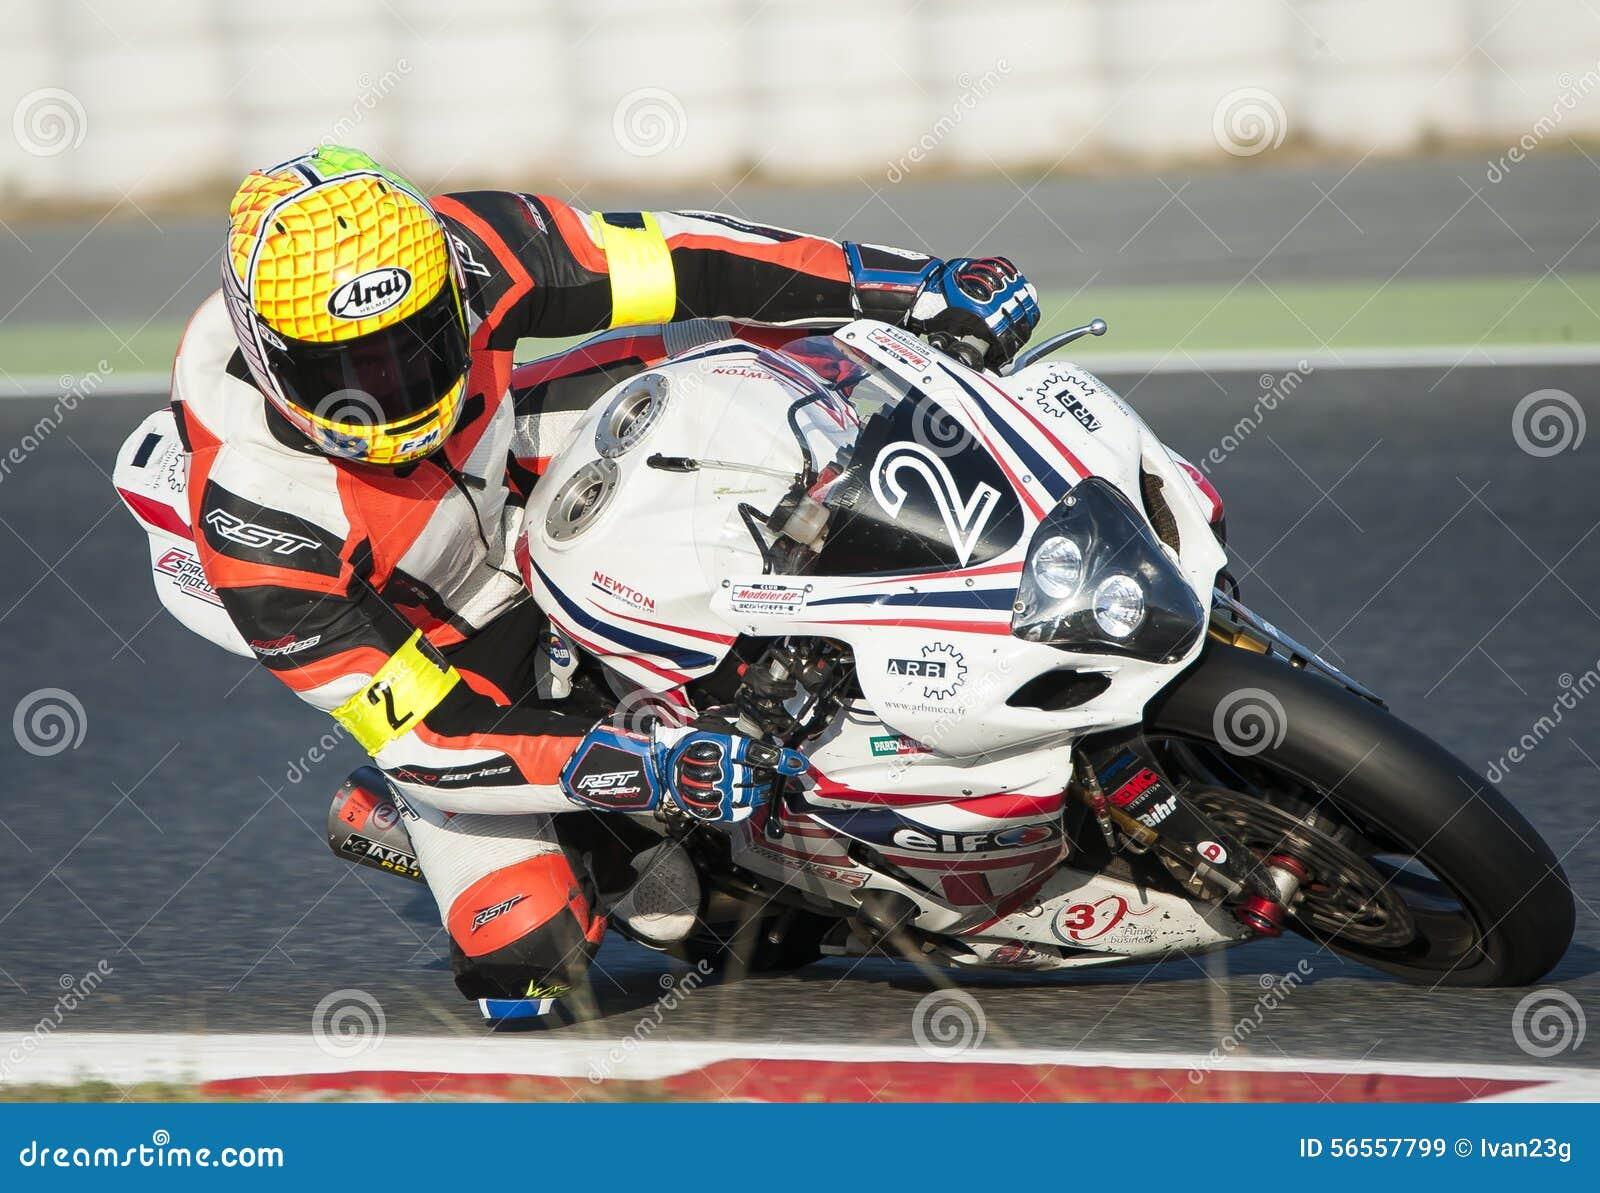 Download 24 ΑΝΤΟΧΗ ΩΡΩΝ MOTORCYCLING ΤΗΣ ΒΑΡΚΕΛΩΝΗΣ Εκδοτική Στοκ Εικόνα - εικόνα από μηχανή, κύκλωμα: 56557799